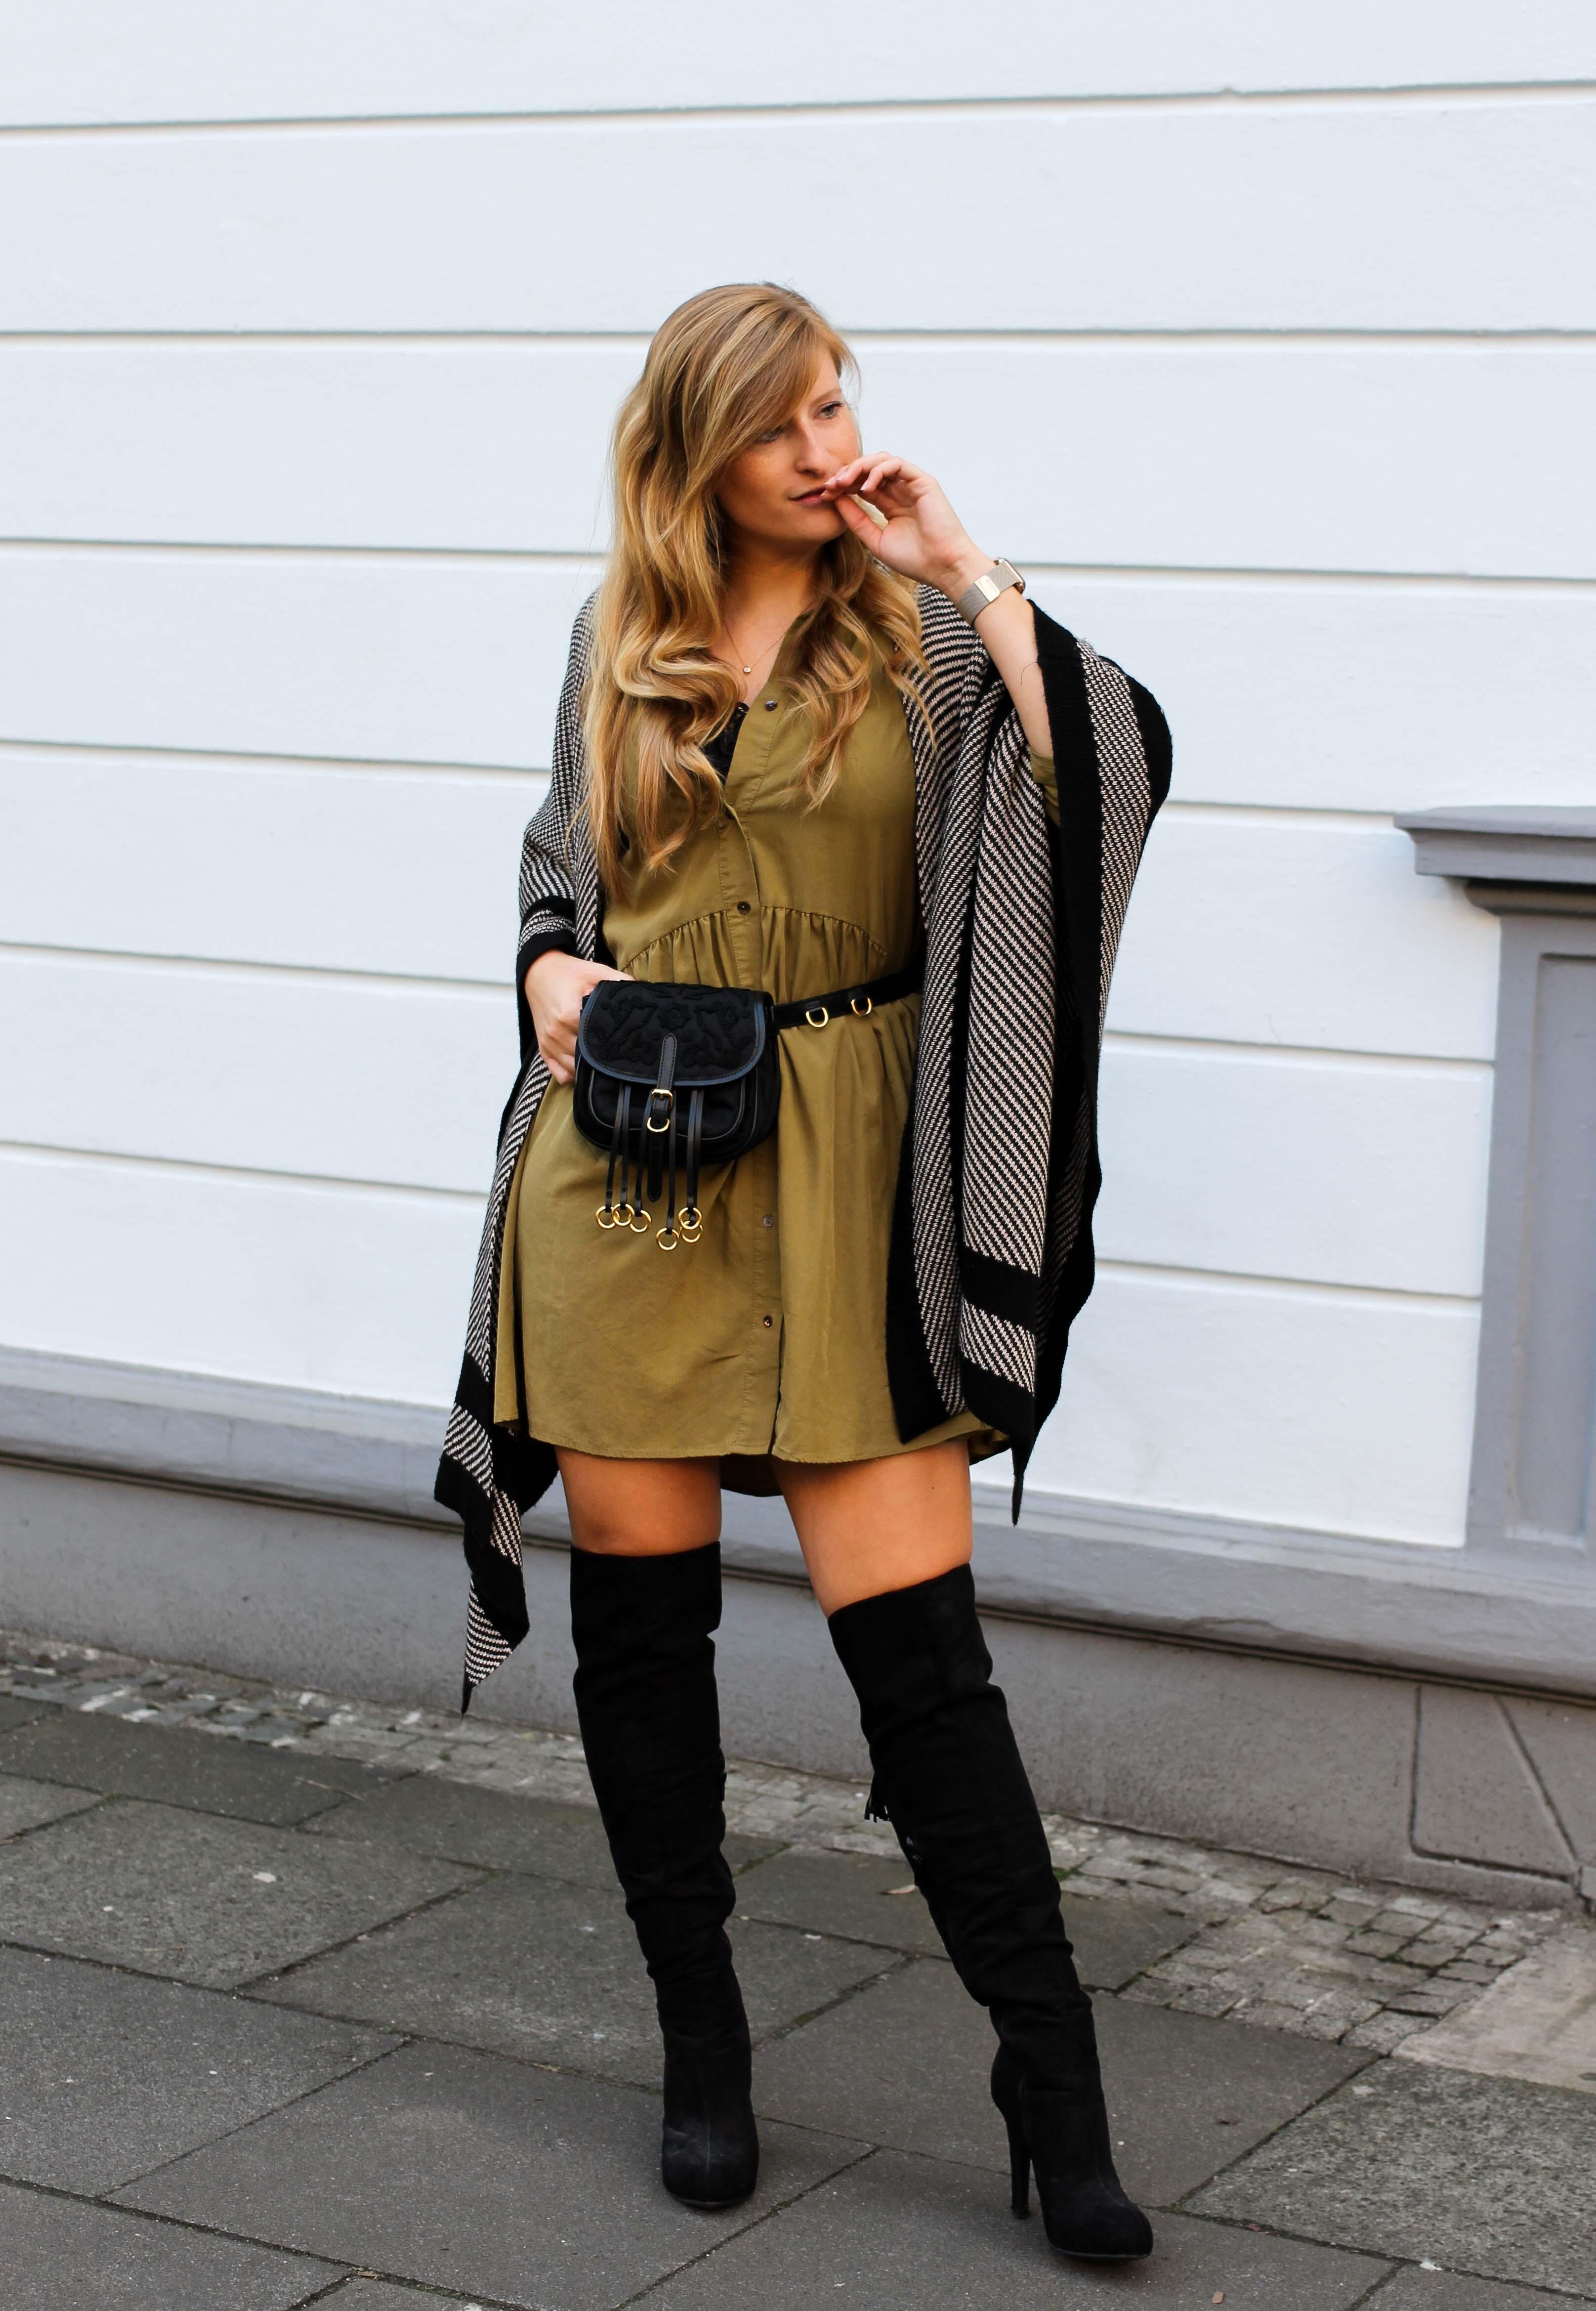 Overknees Gürteltasche Prada Trendtasche 2019 Poncho Second-Hand Kleidung kombinieren Streetstyle Outfit Bonn Zara Kleid grün 6